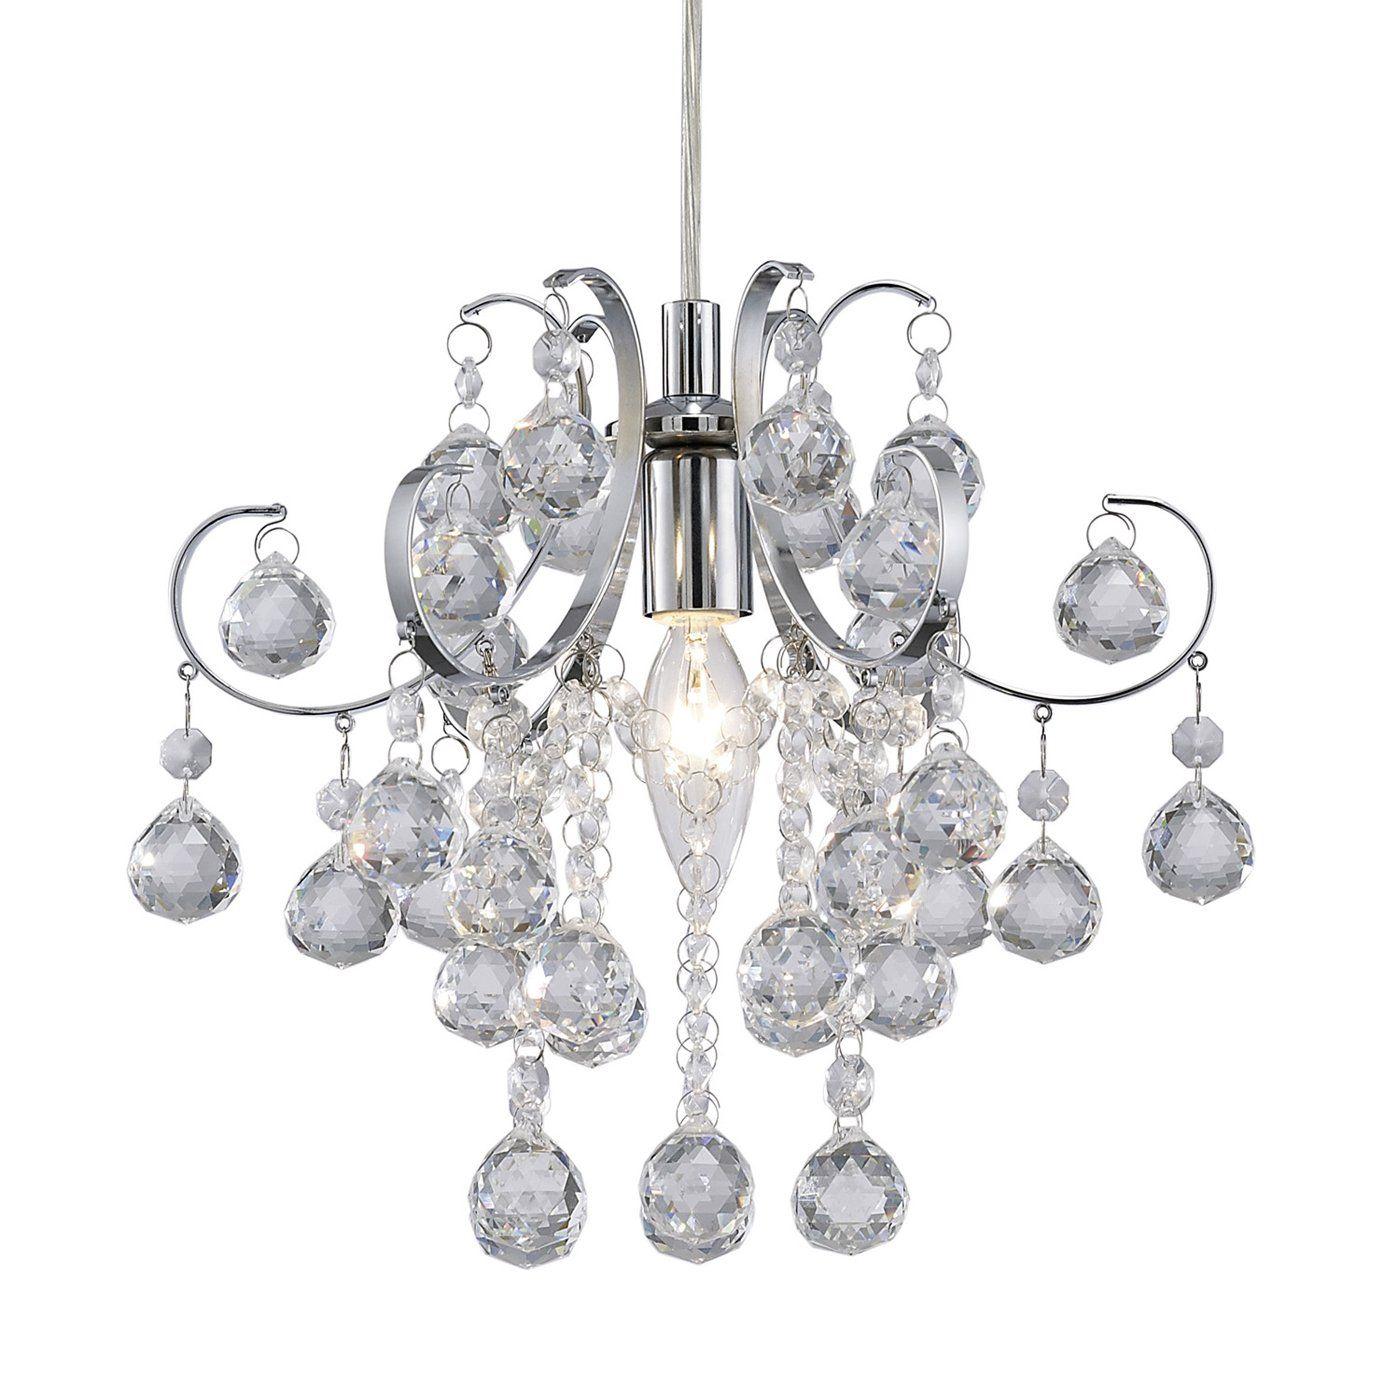 Canarm ipl174b01ch 1 light tessa mini chandelier thats what im canarm ipl174b01ch 1 light tessa mini chandelier thats what im talkin about arubaitofo Choice Image